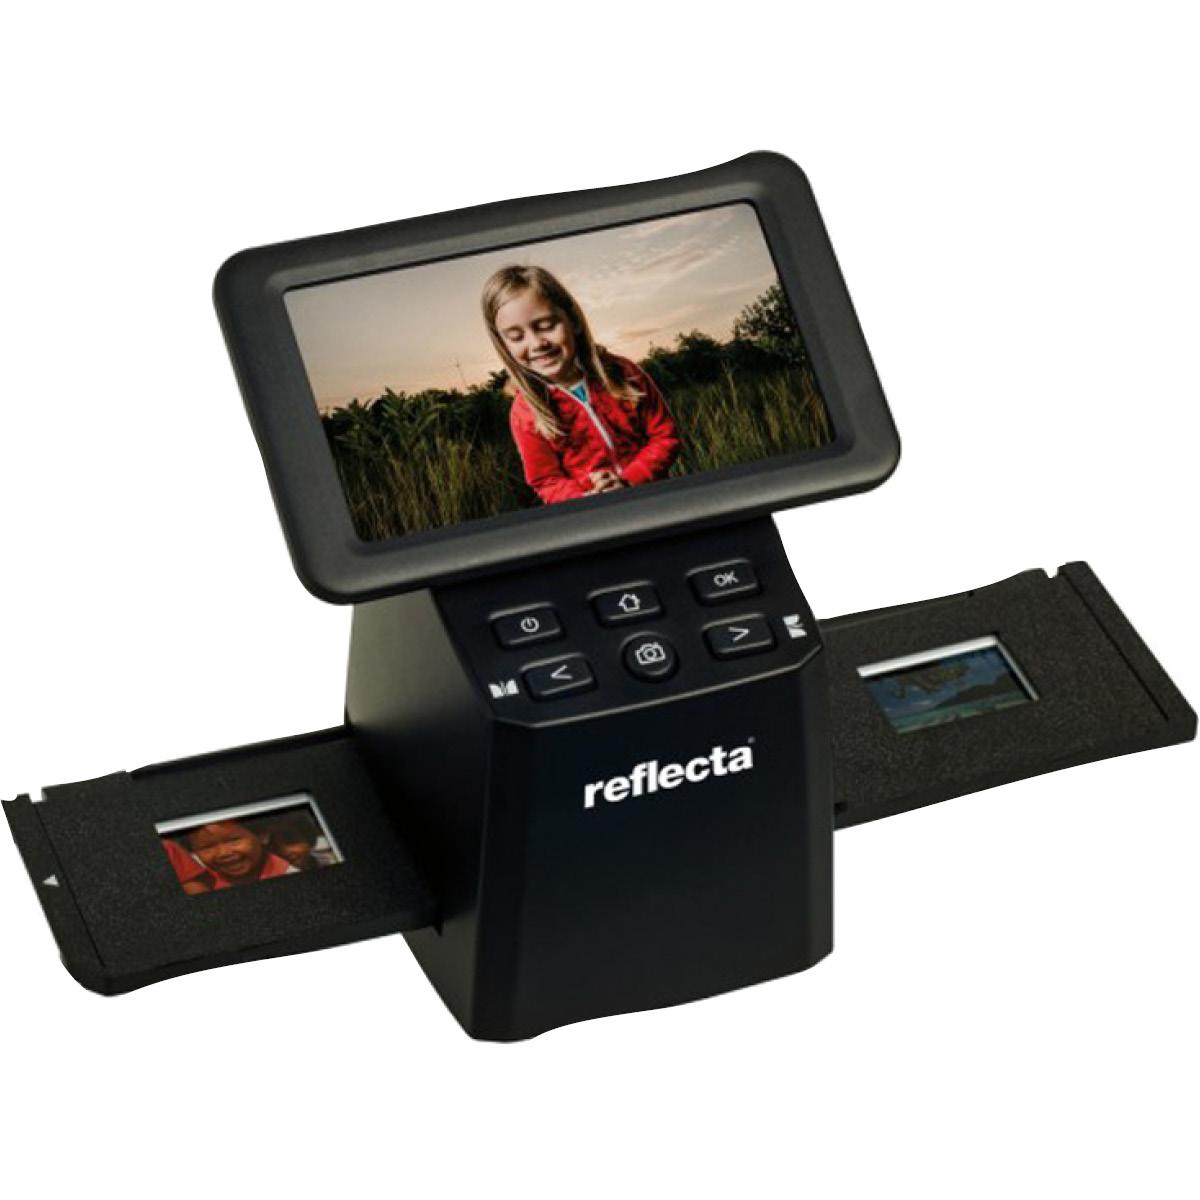 Reflecta x33 Dia-/Filmscanner